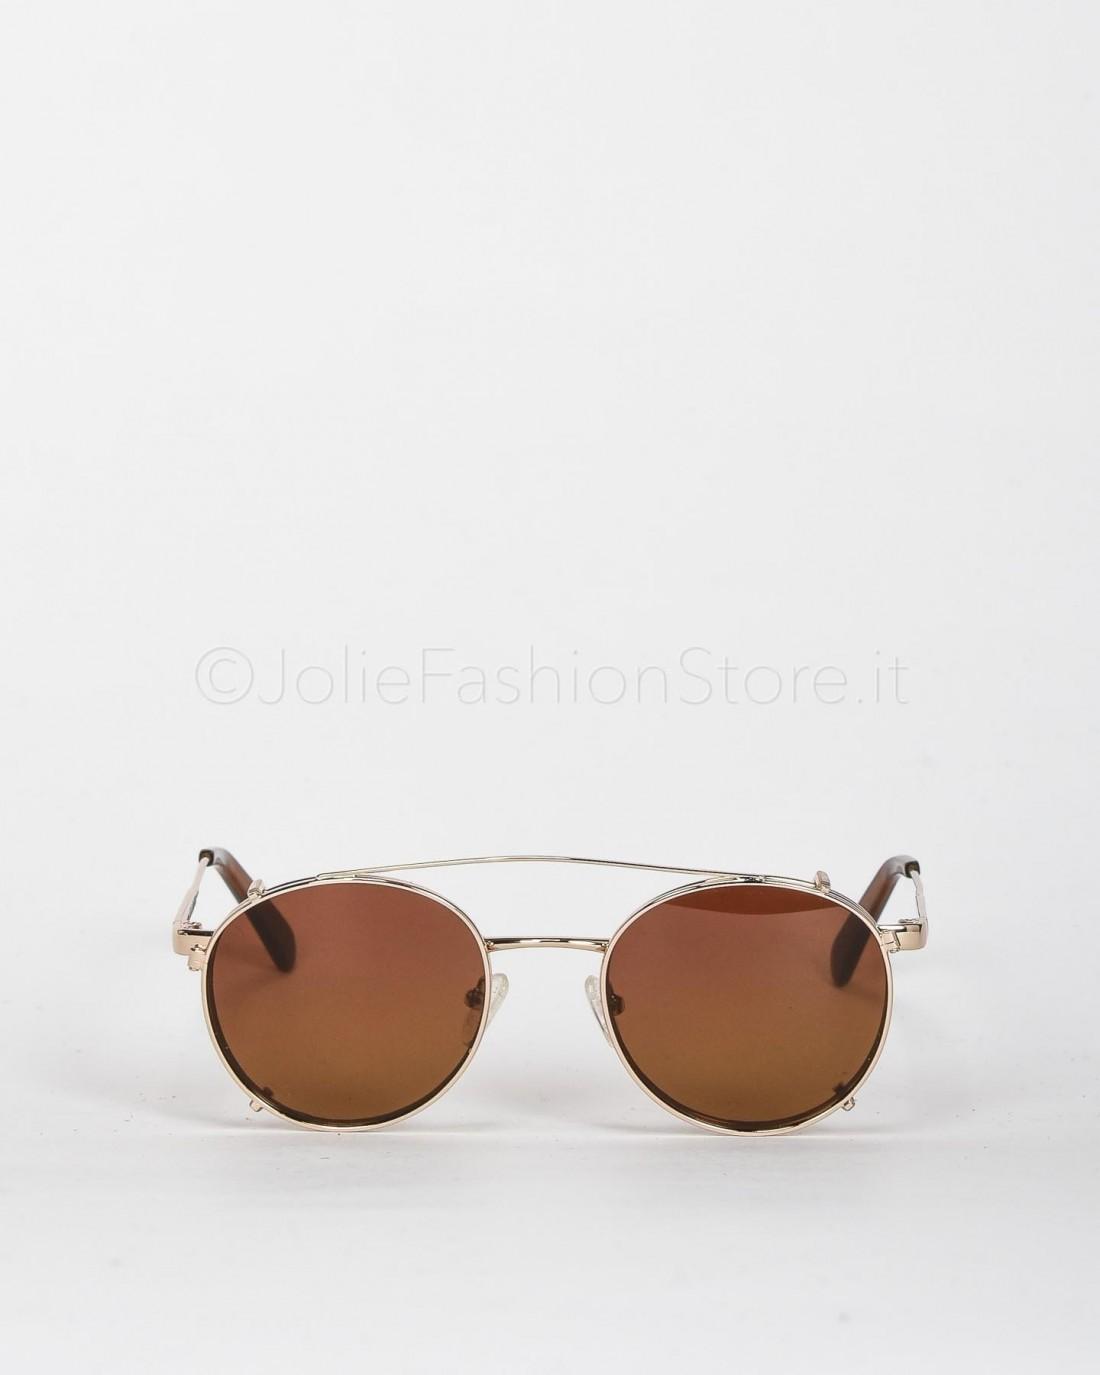 Blinded Occhiali da Sole Mod. WhitSunday in Metallo Oro con Lente Rosa-Giallo con Clip On Marrone  WHITSUNDAY GOLD